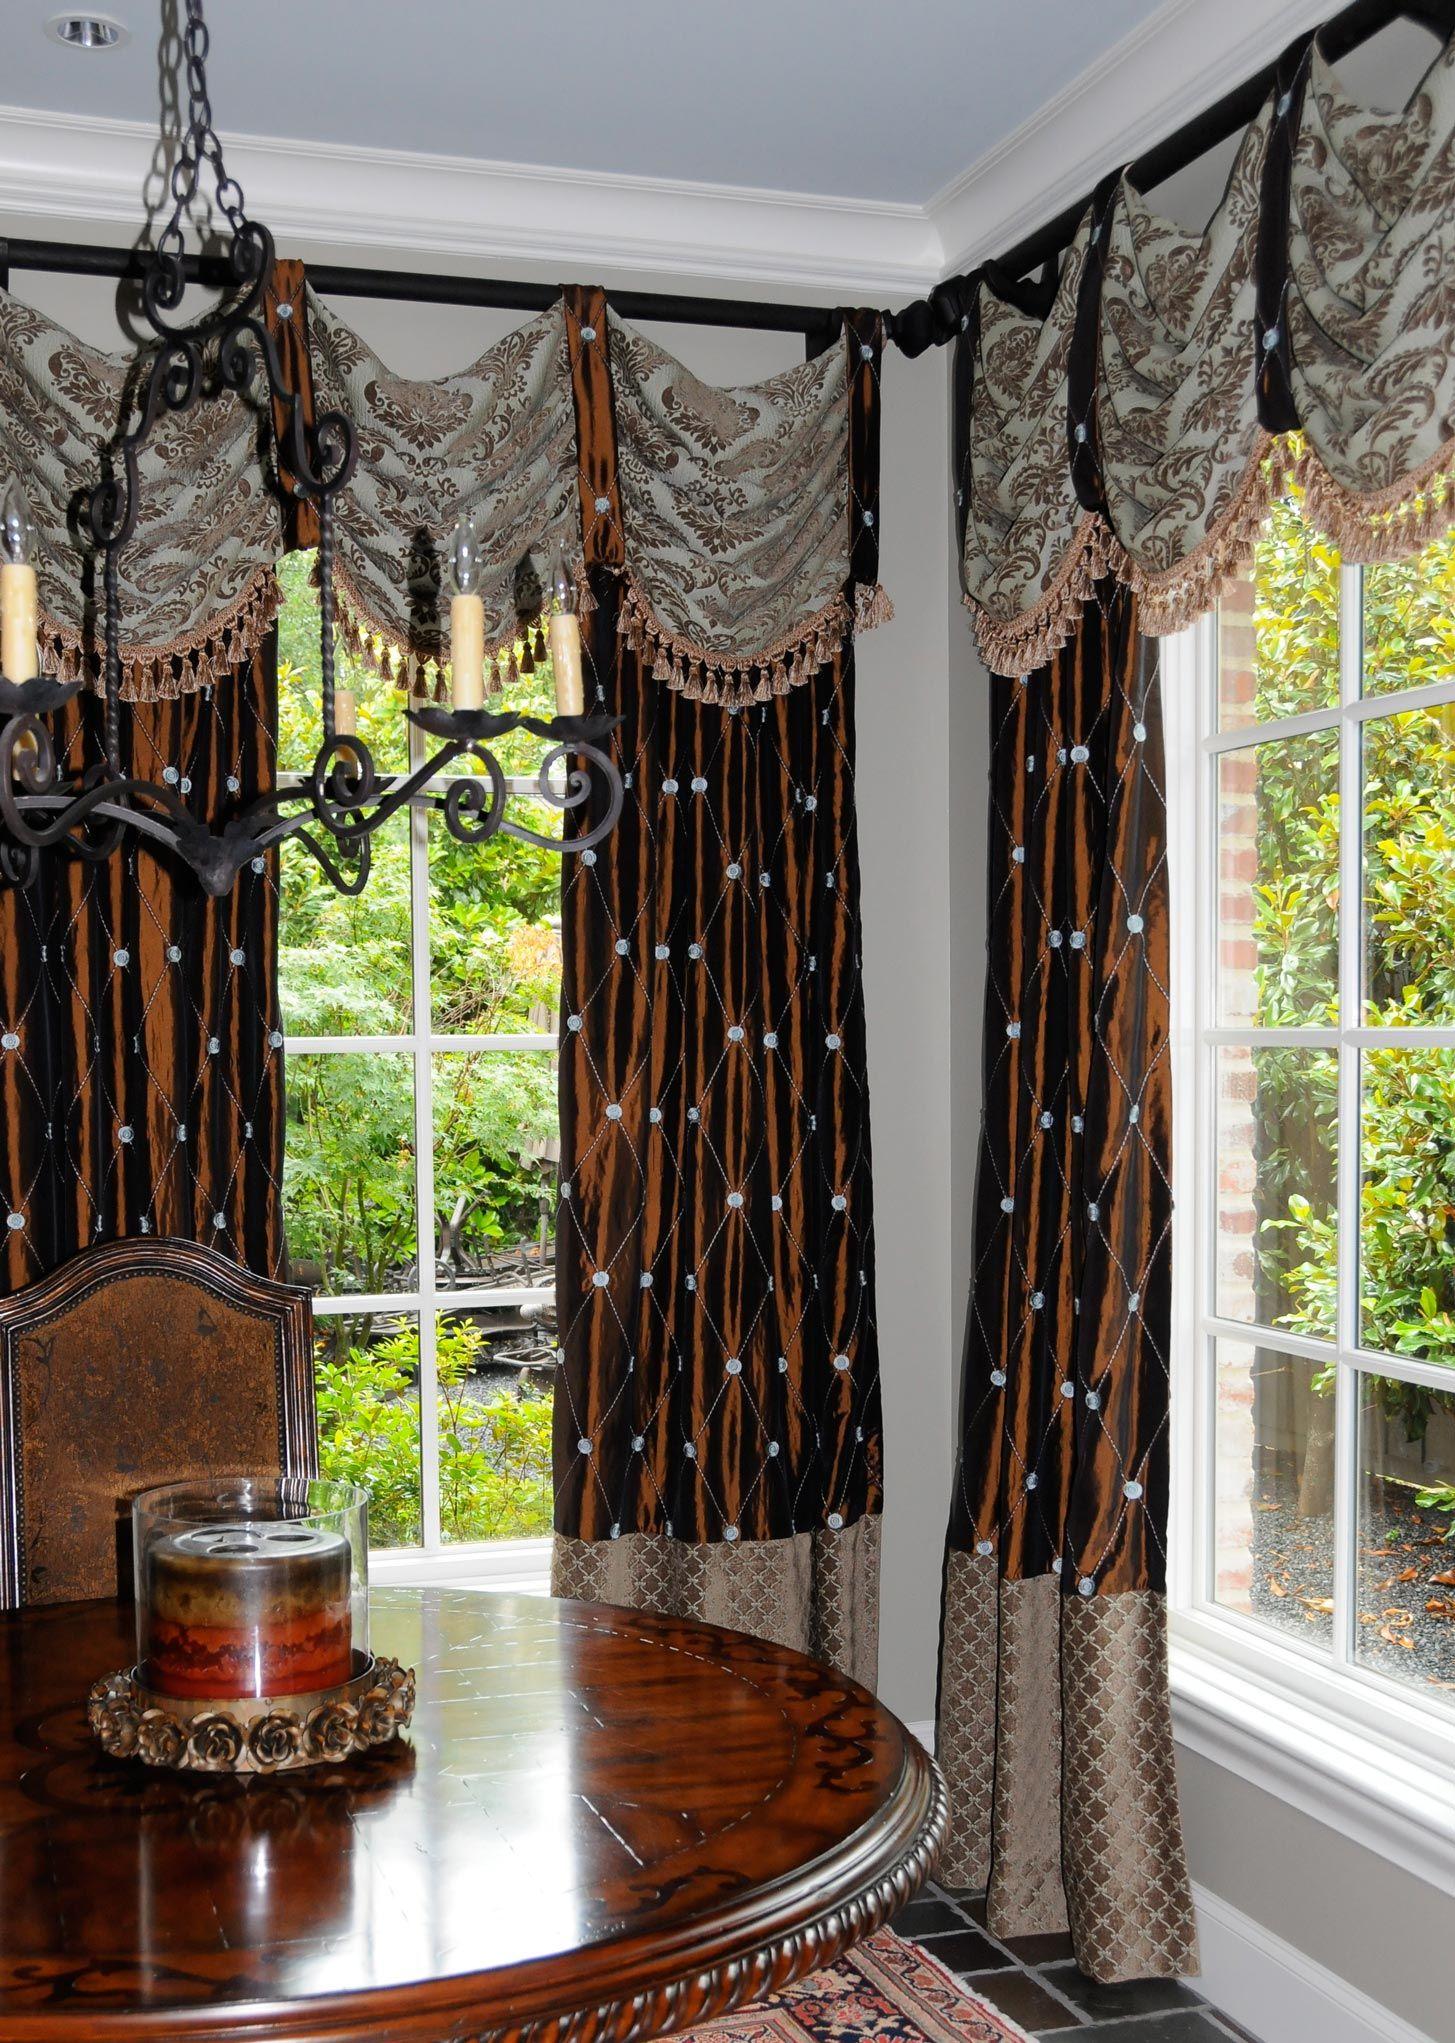 Room Grandeur Designs Tuscan CurtainsDrapes CurtainsDining